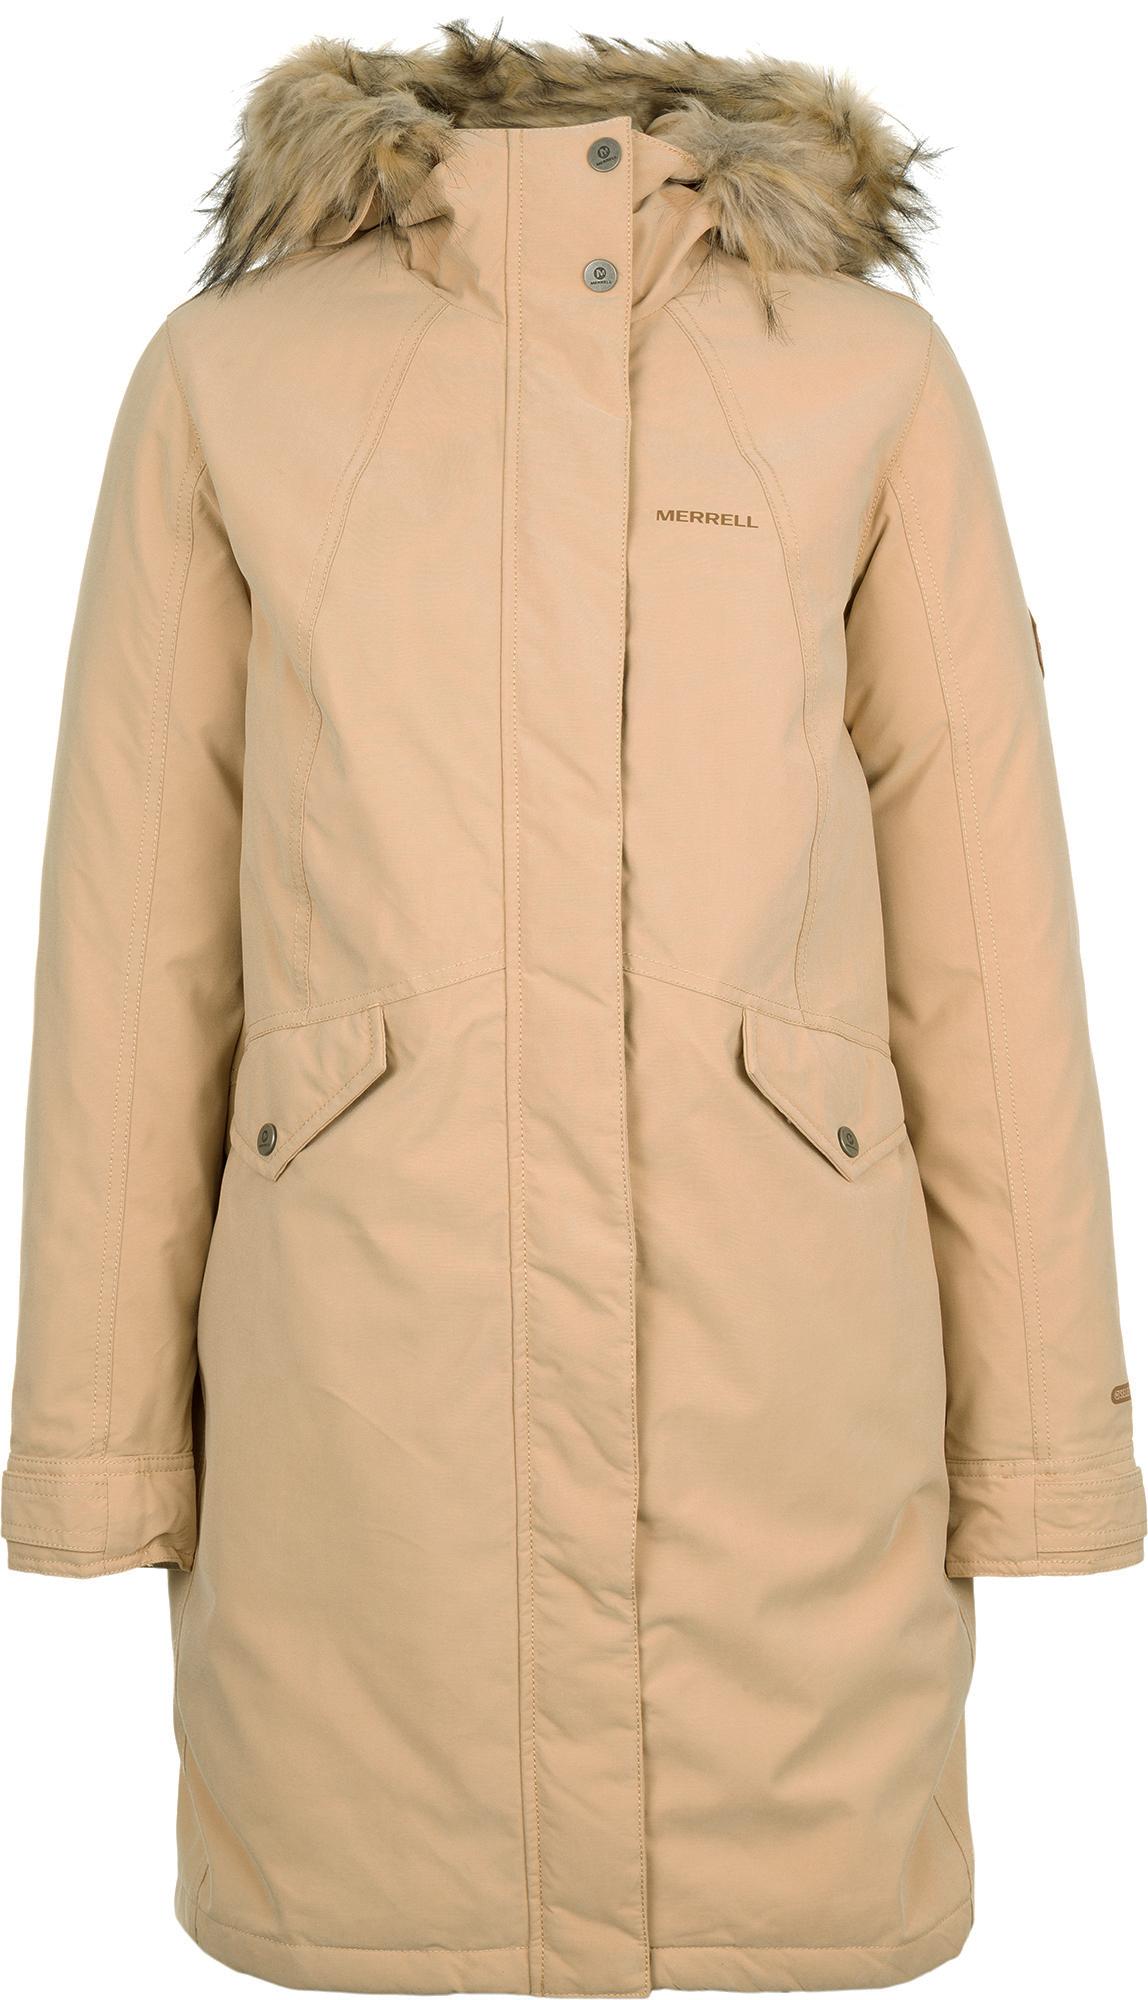 Merrell Куртка пуховая женская Merrell merrell куртка утепленная женская merrell